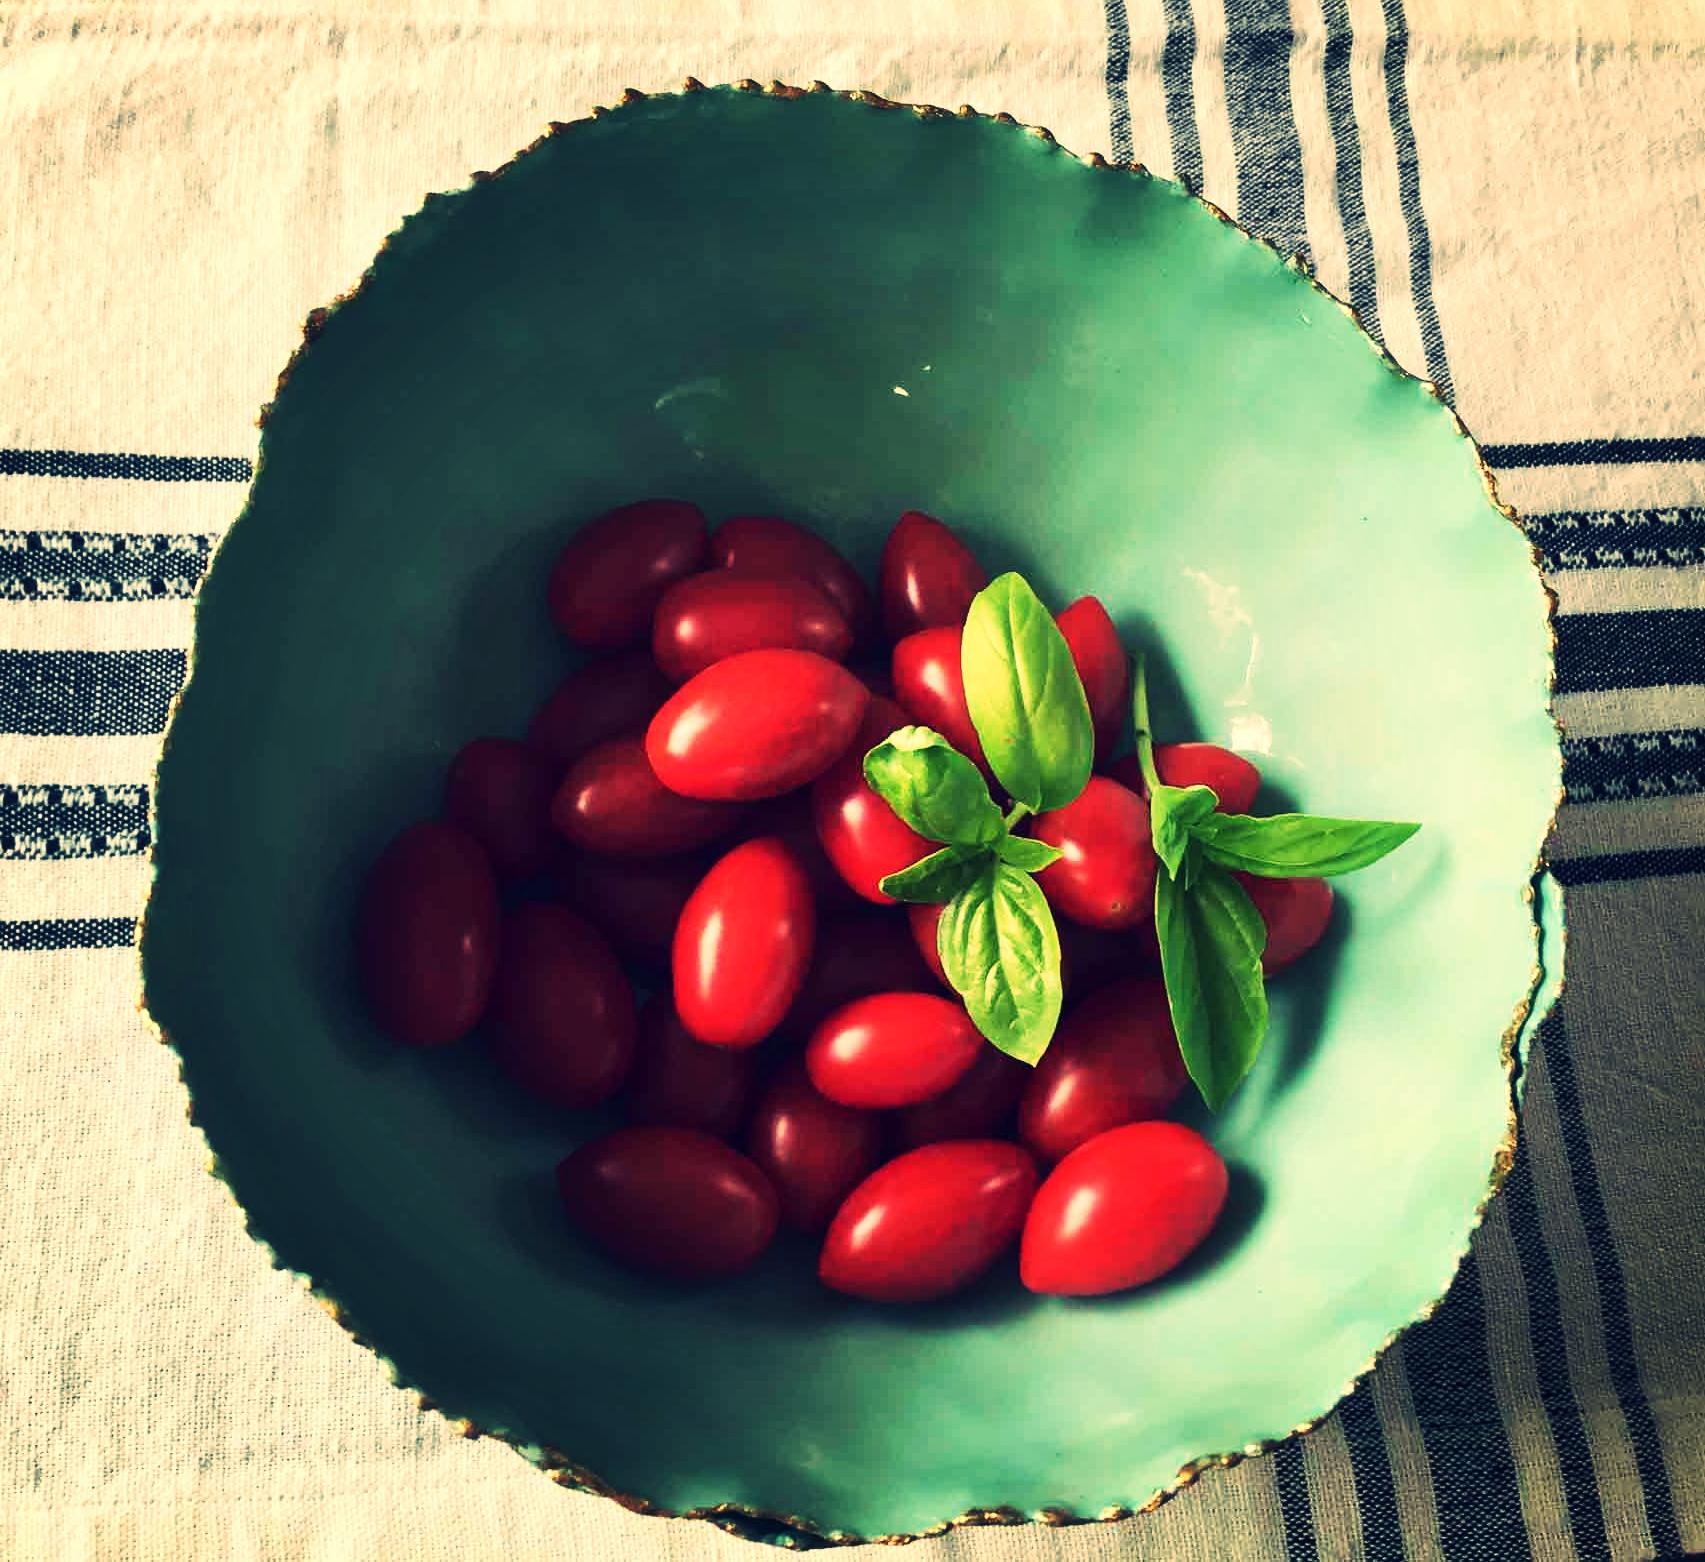 tomato-basil-recipe-4.JPG